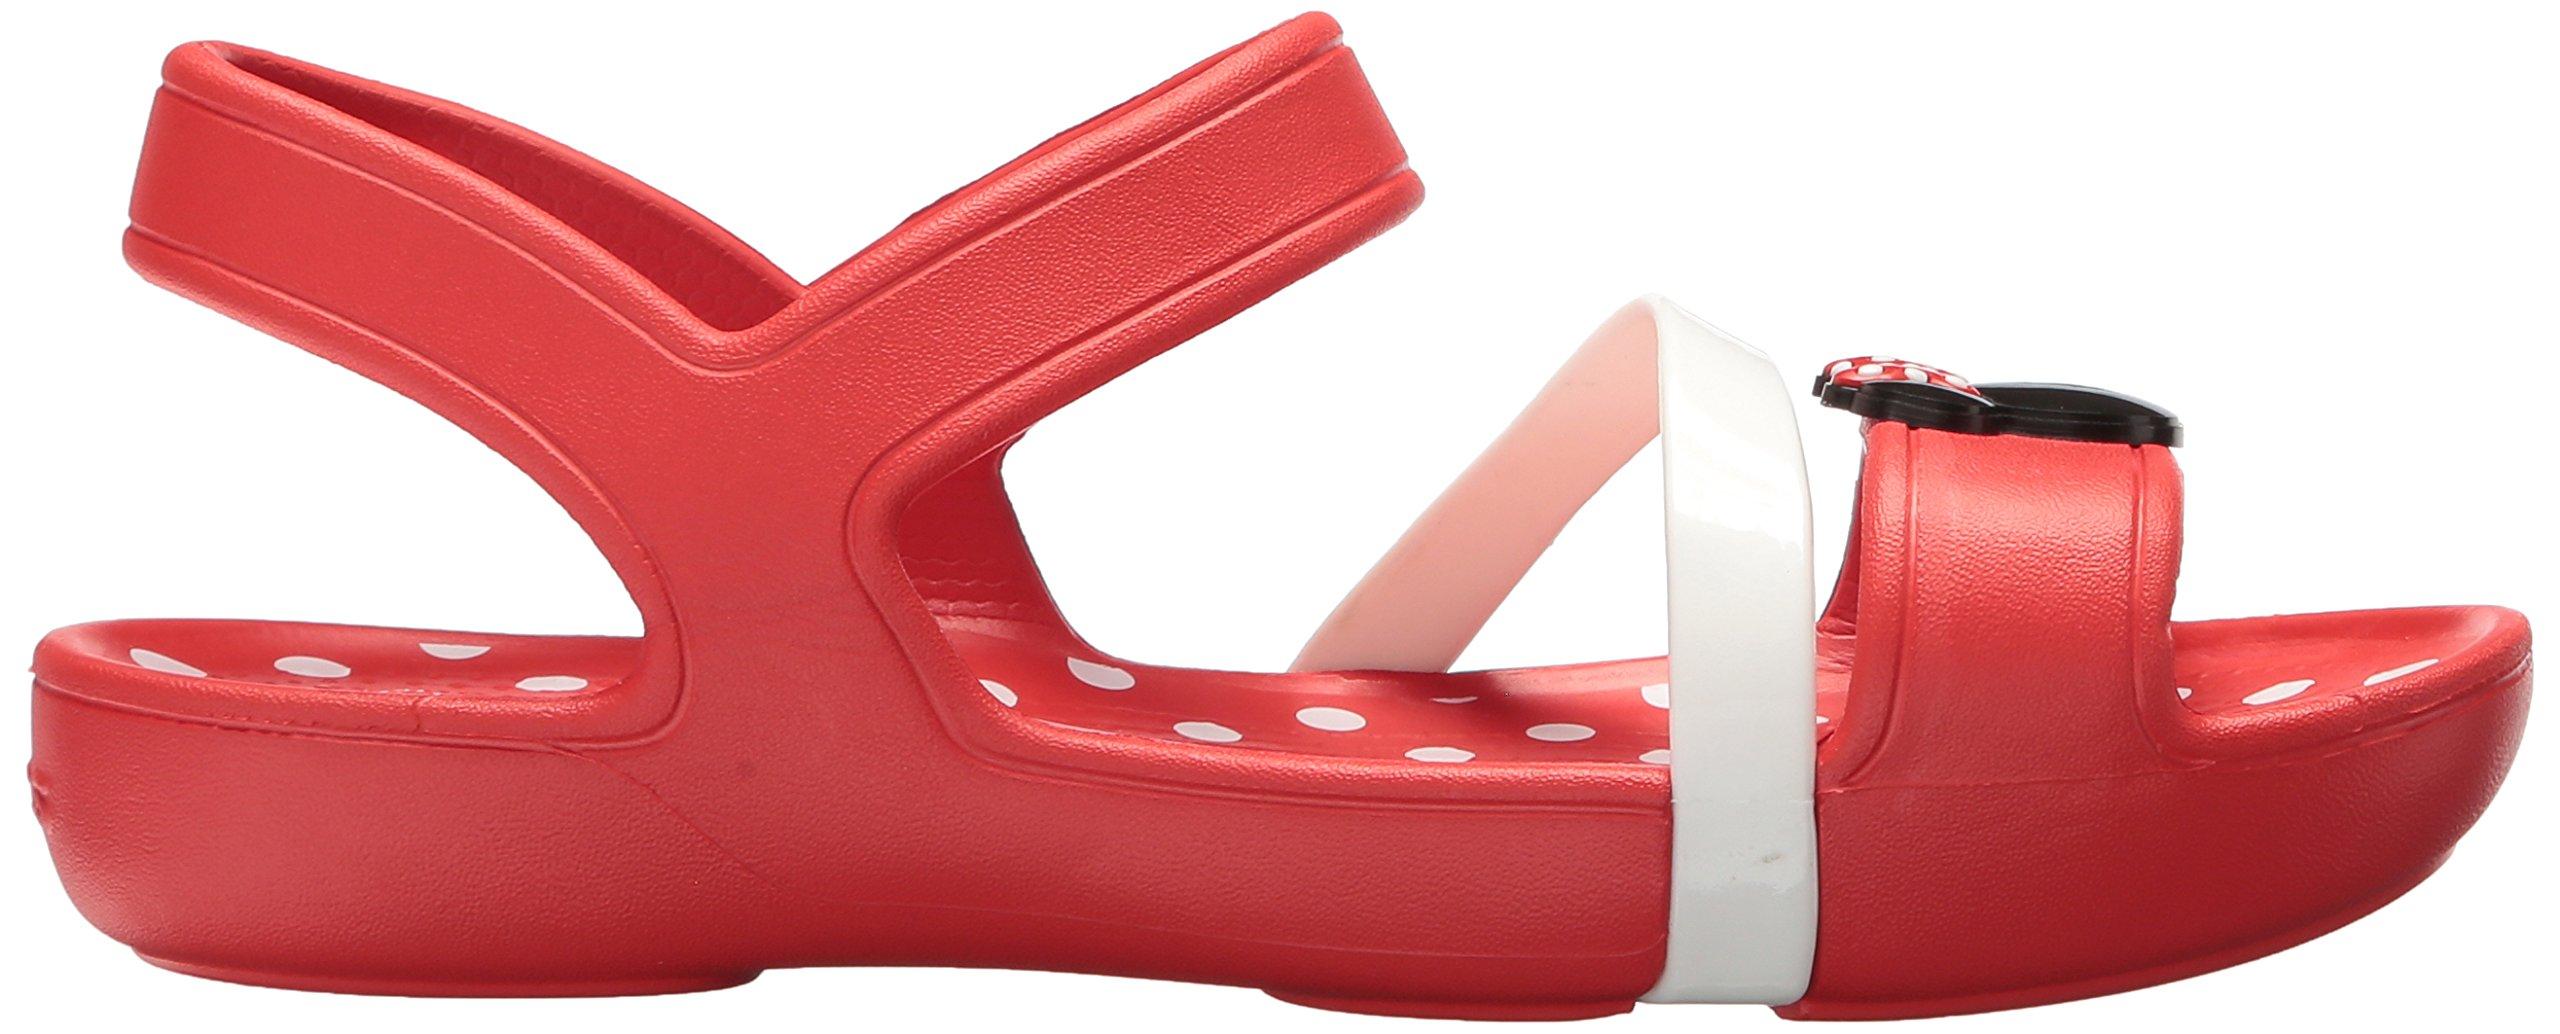 0ea3f7535b73ba Crocs Kids  Lina Minnie Mouse Sandal   Sandals   Clothing